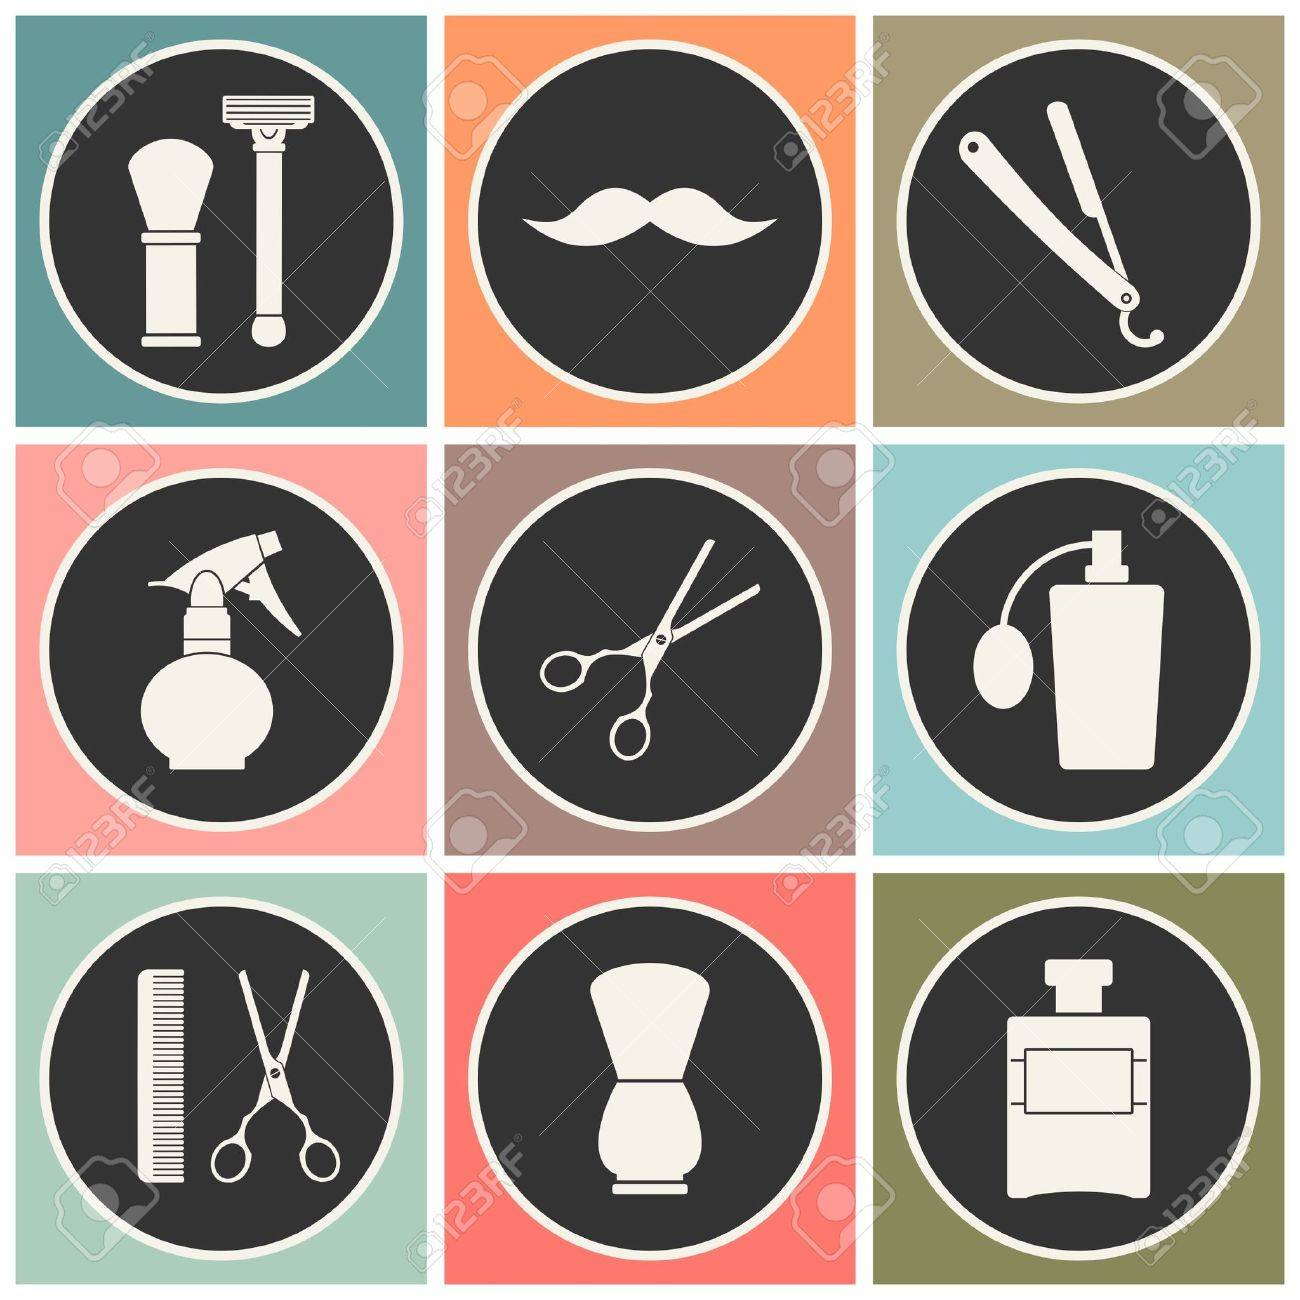 Clip art vector of vintage barber shop logo graphics and icon vector - Barber Shop Vintage Old Fashioned Icons Set Stock Vector 41056330